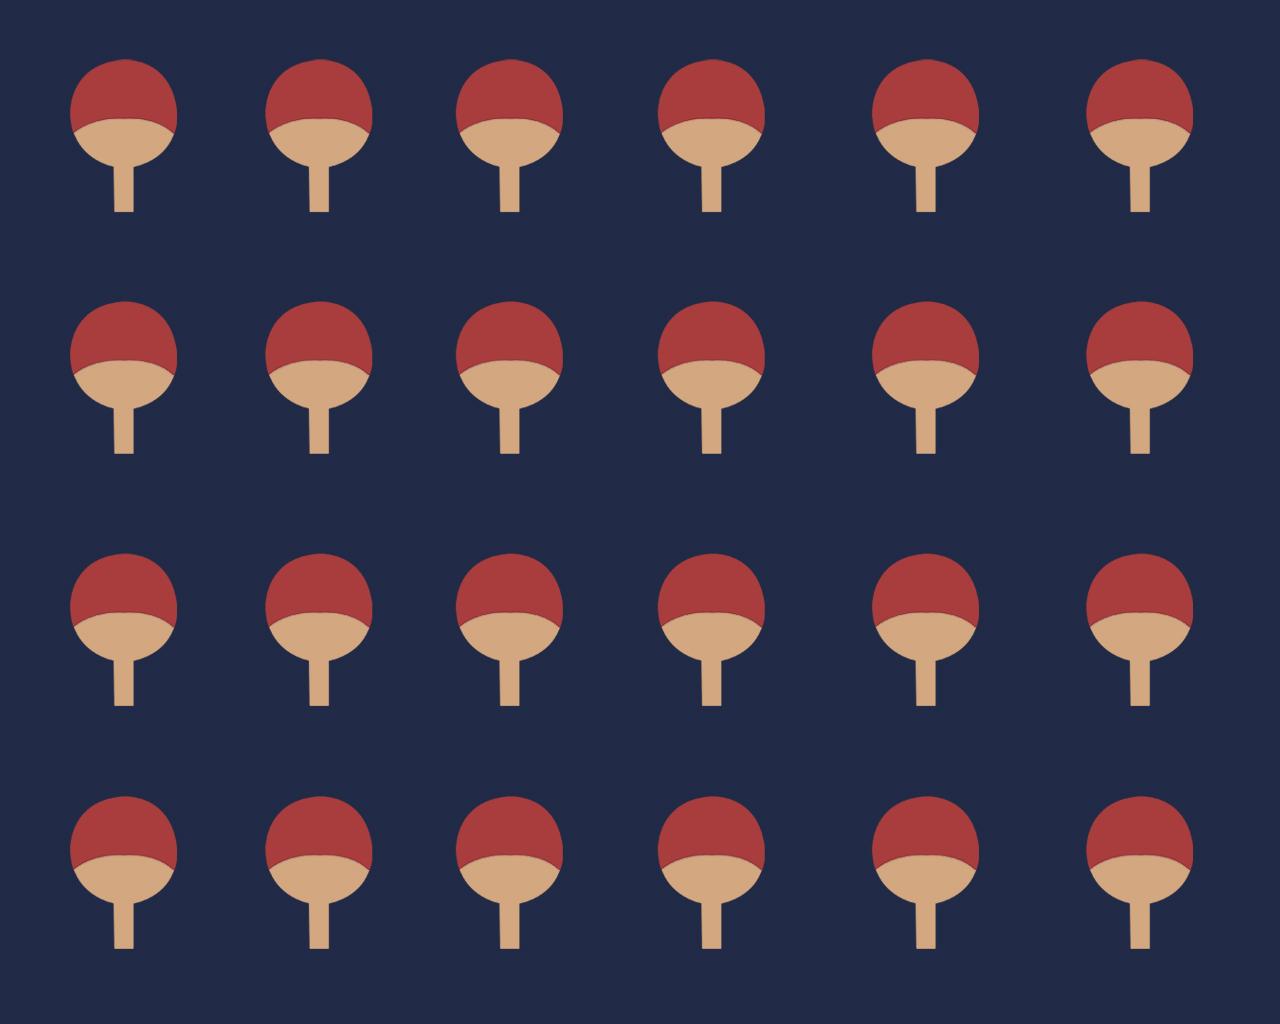 Uchiha Symbol Wallpaper Ver 1 by BondWithColors 1280x1024